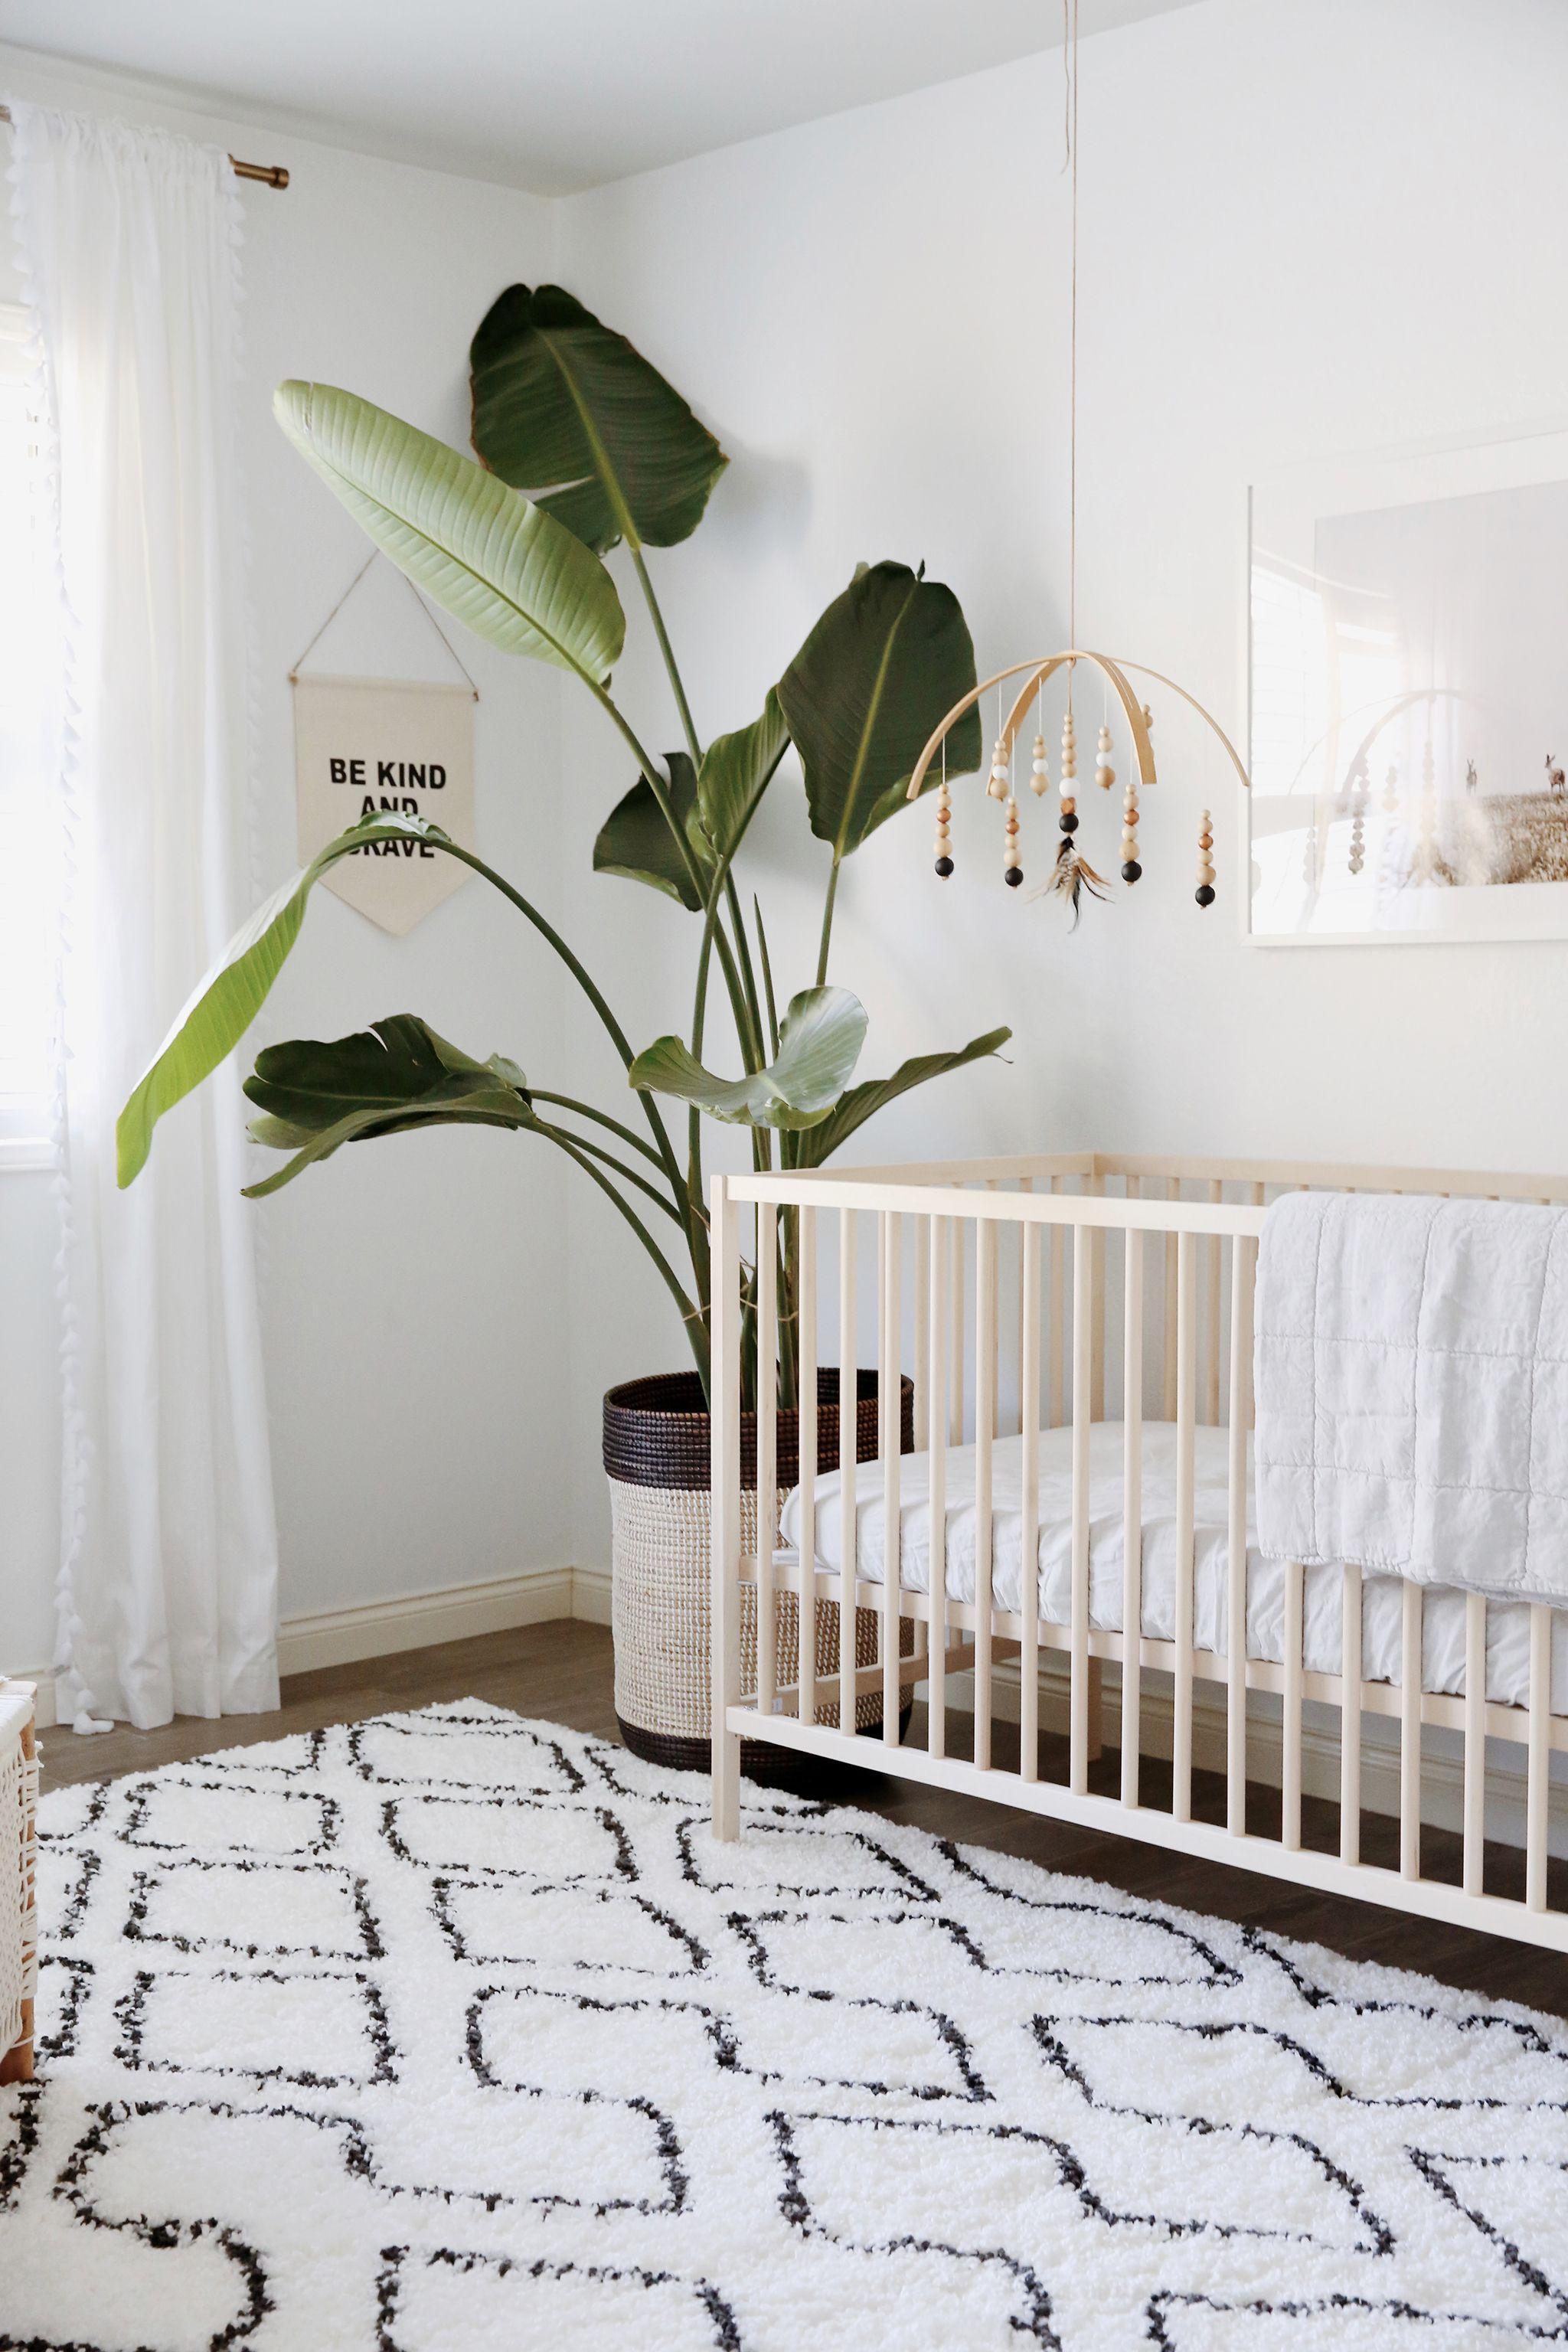 In The Nursery With Mary Lauren Project Nursery Gender Neutral Nursery Decor Baby Boy Rooms Minimalist Nursery